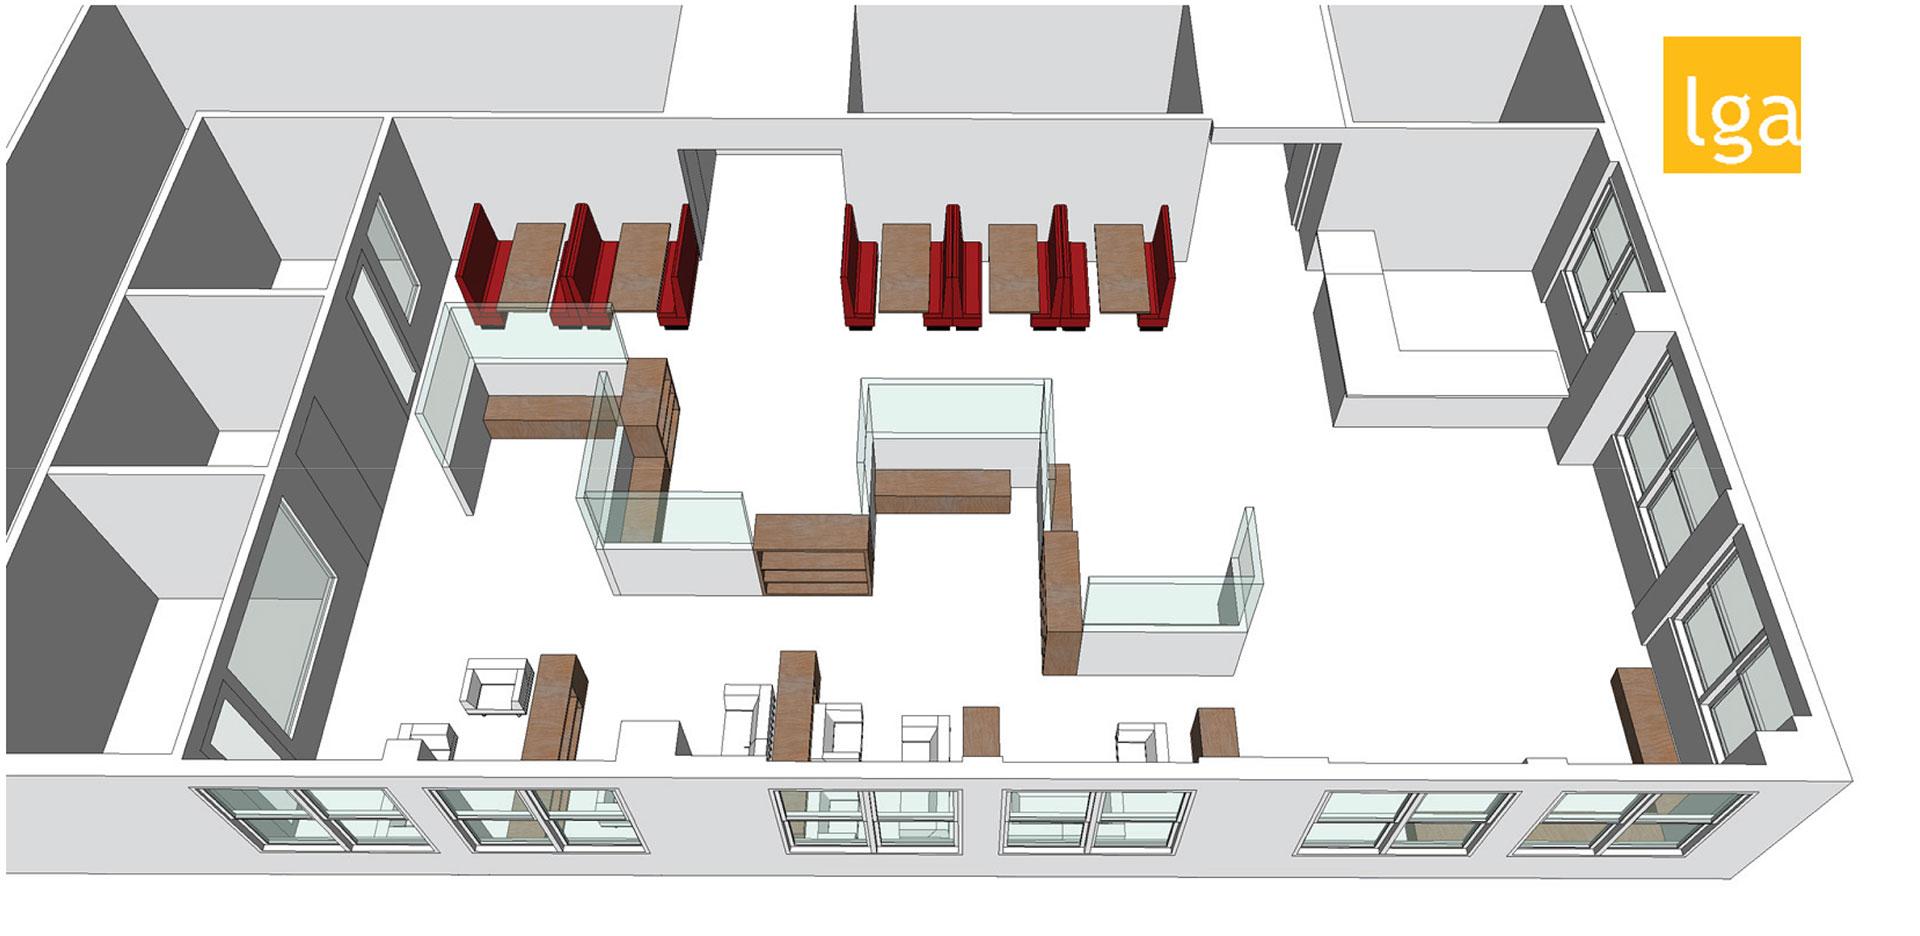 foster-5-booths